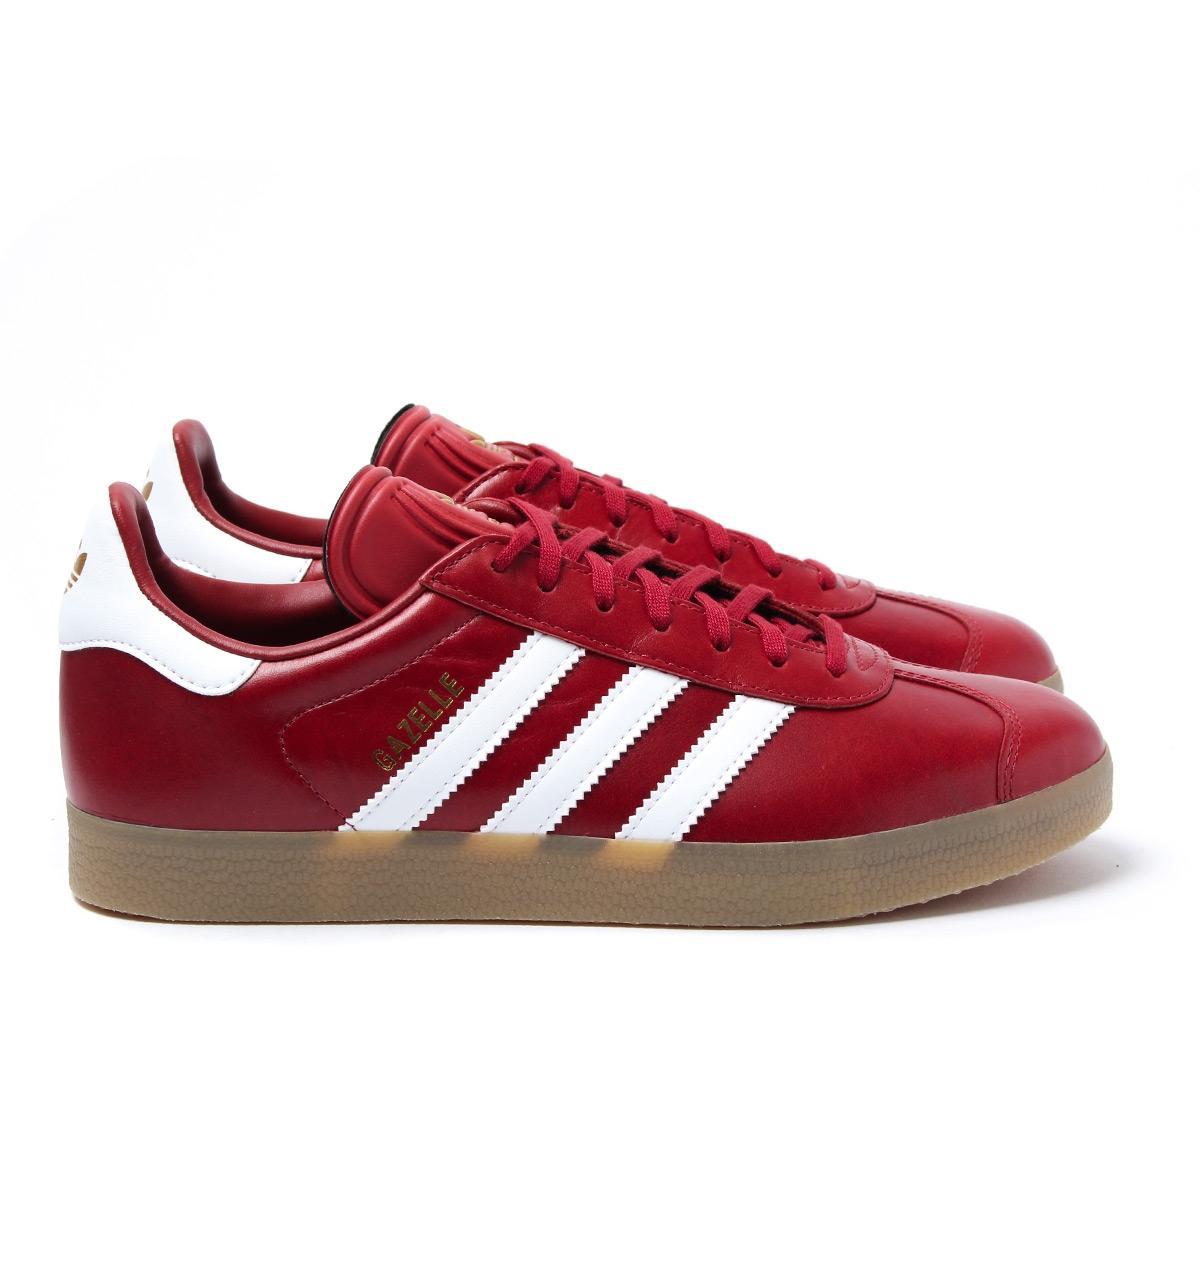 red leather adidas gazelle